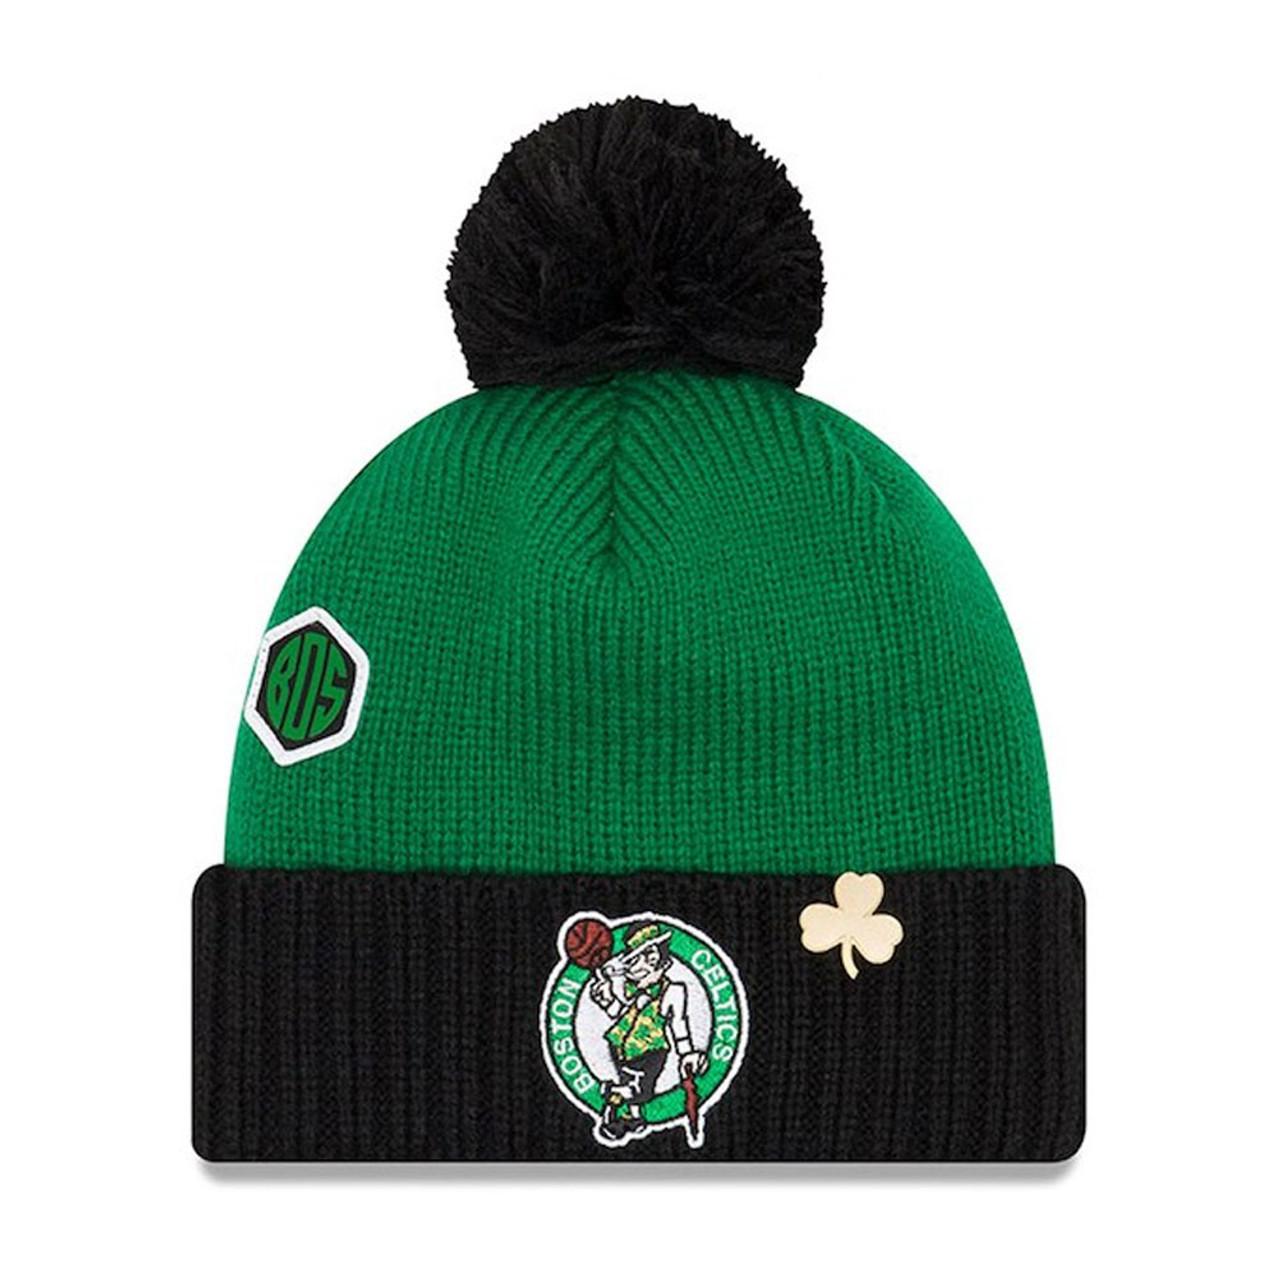 NEW ERA boston celtics NBA basketball team draft cuffed knit hat with pom   kelly green ... 4b2101f7a